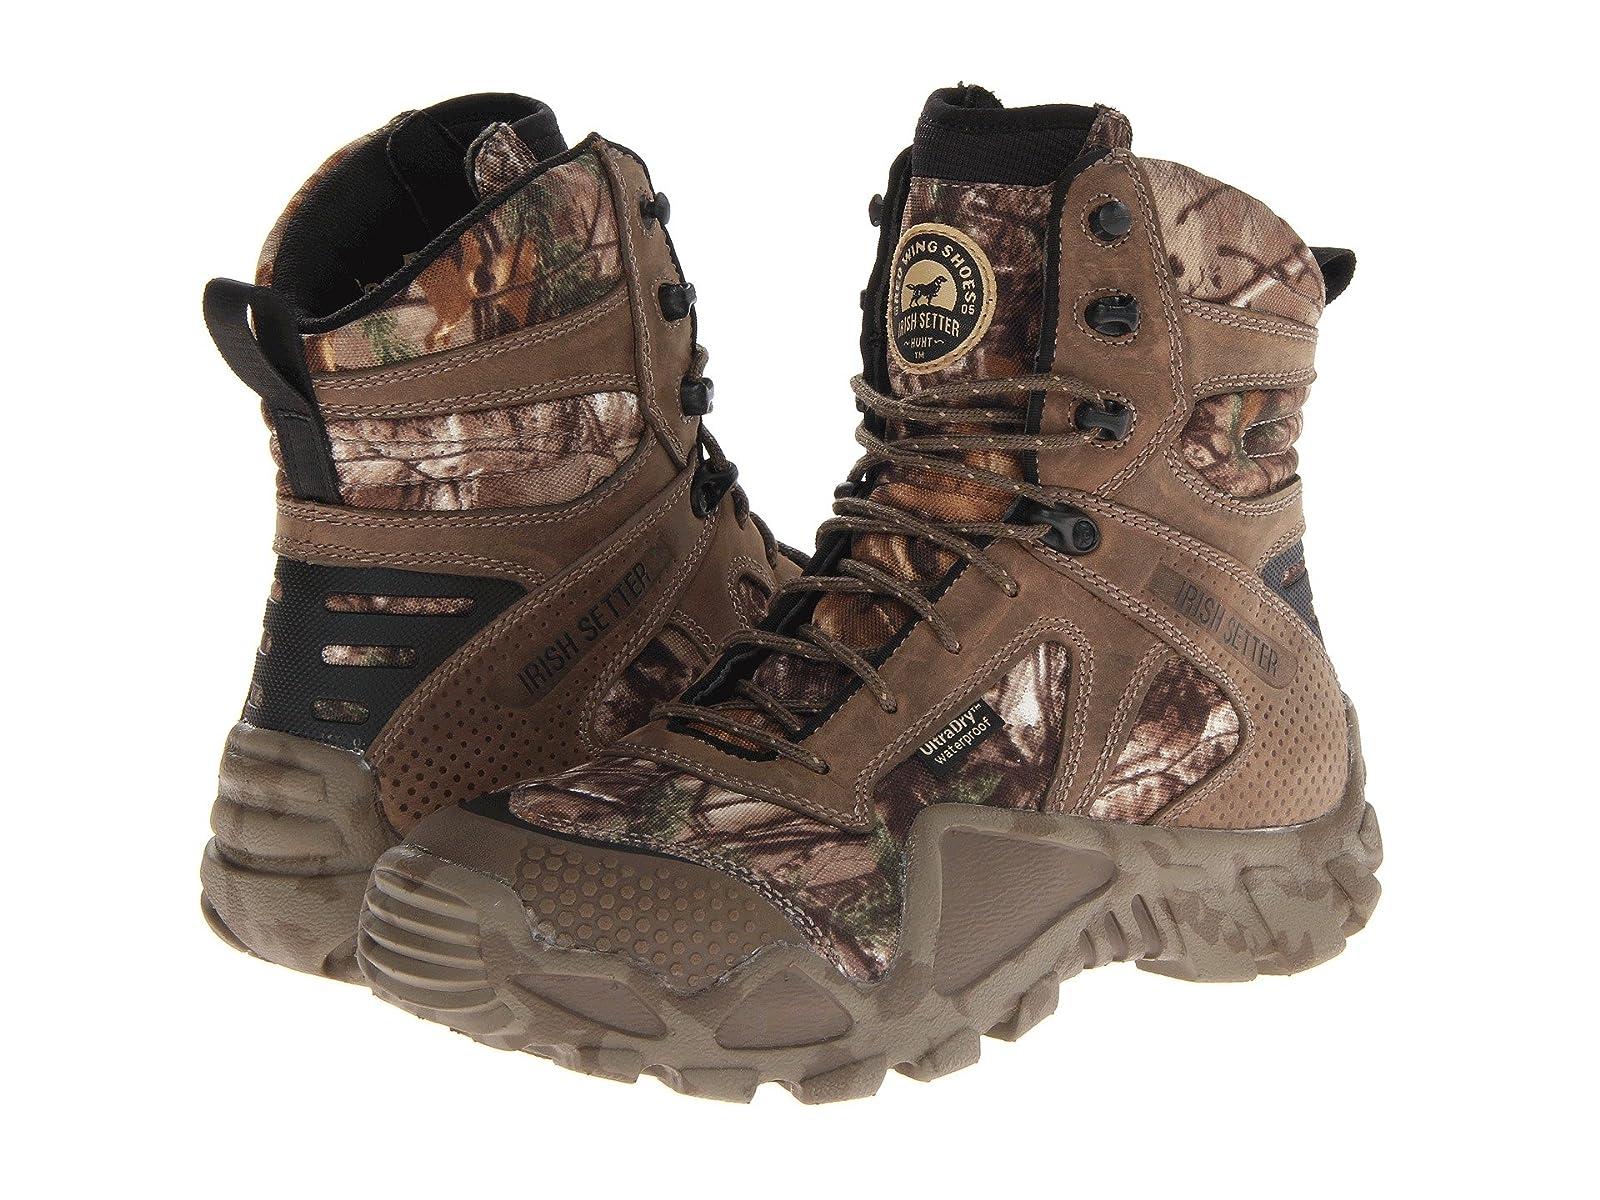 Irish Setter VaprTrekAffordable and distinctive shoes